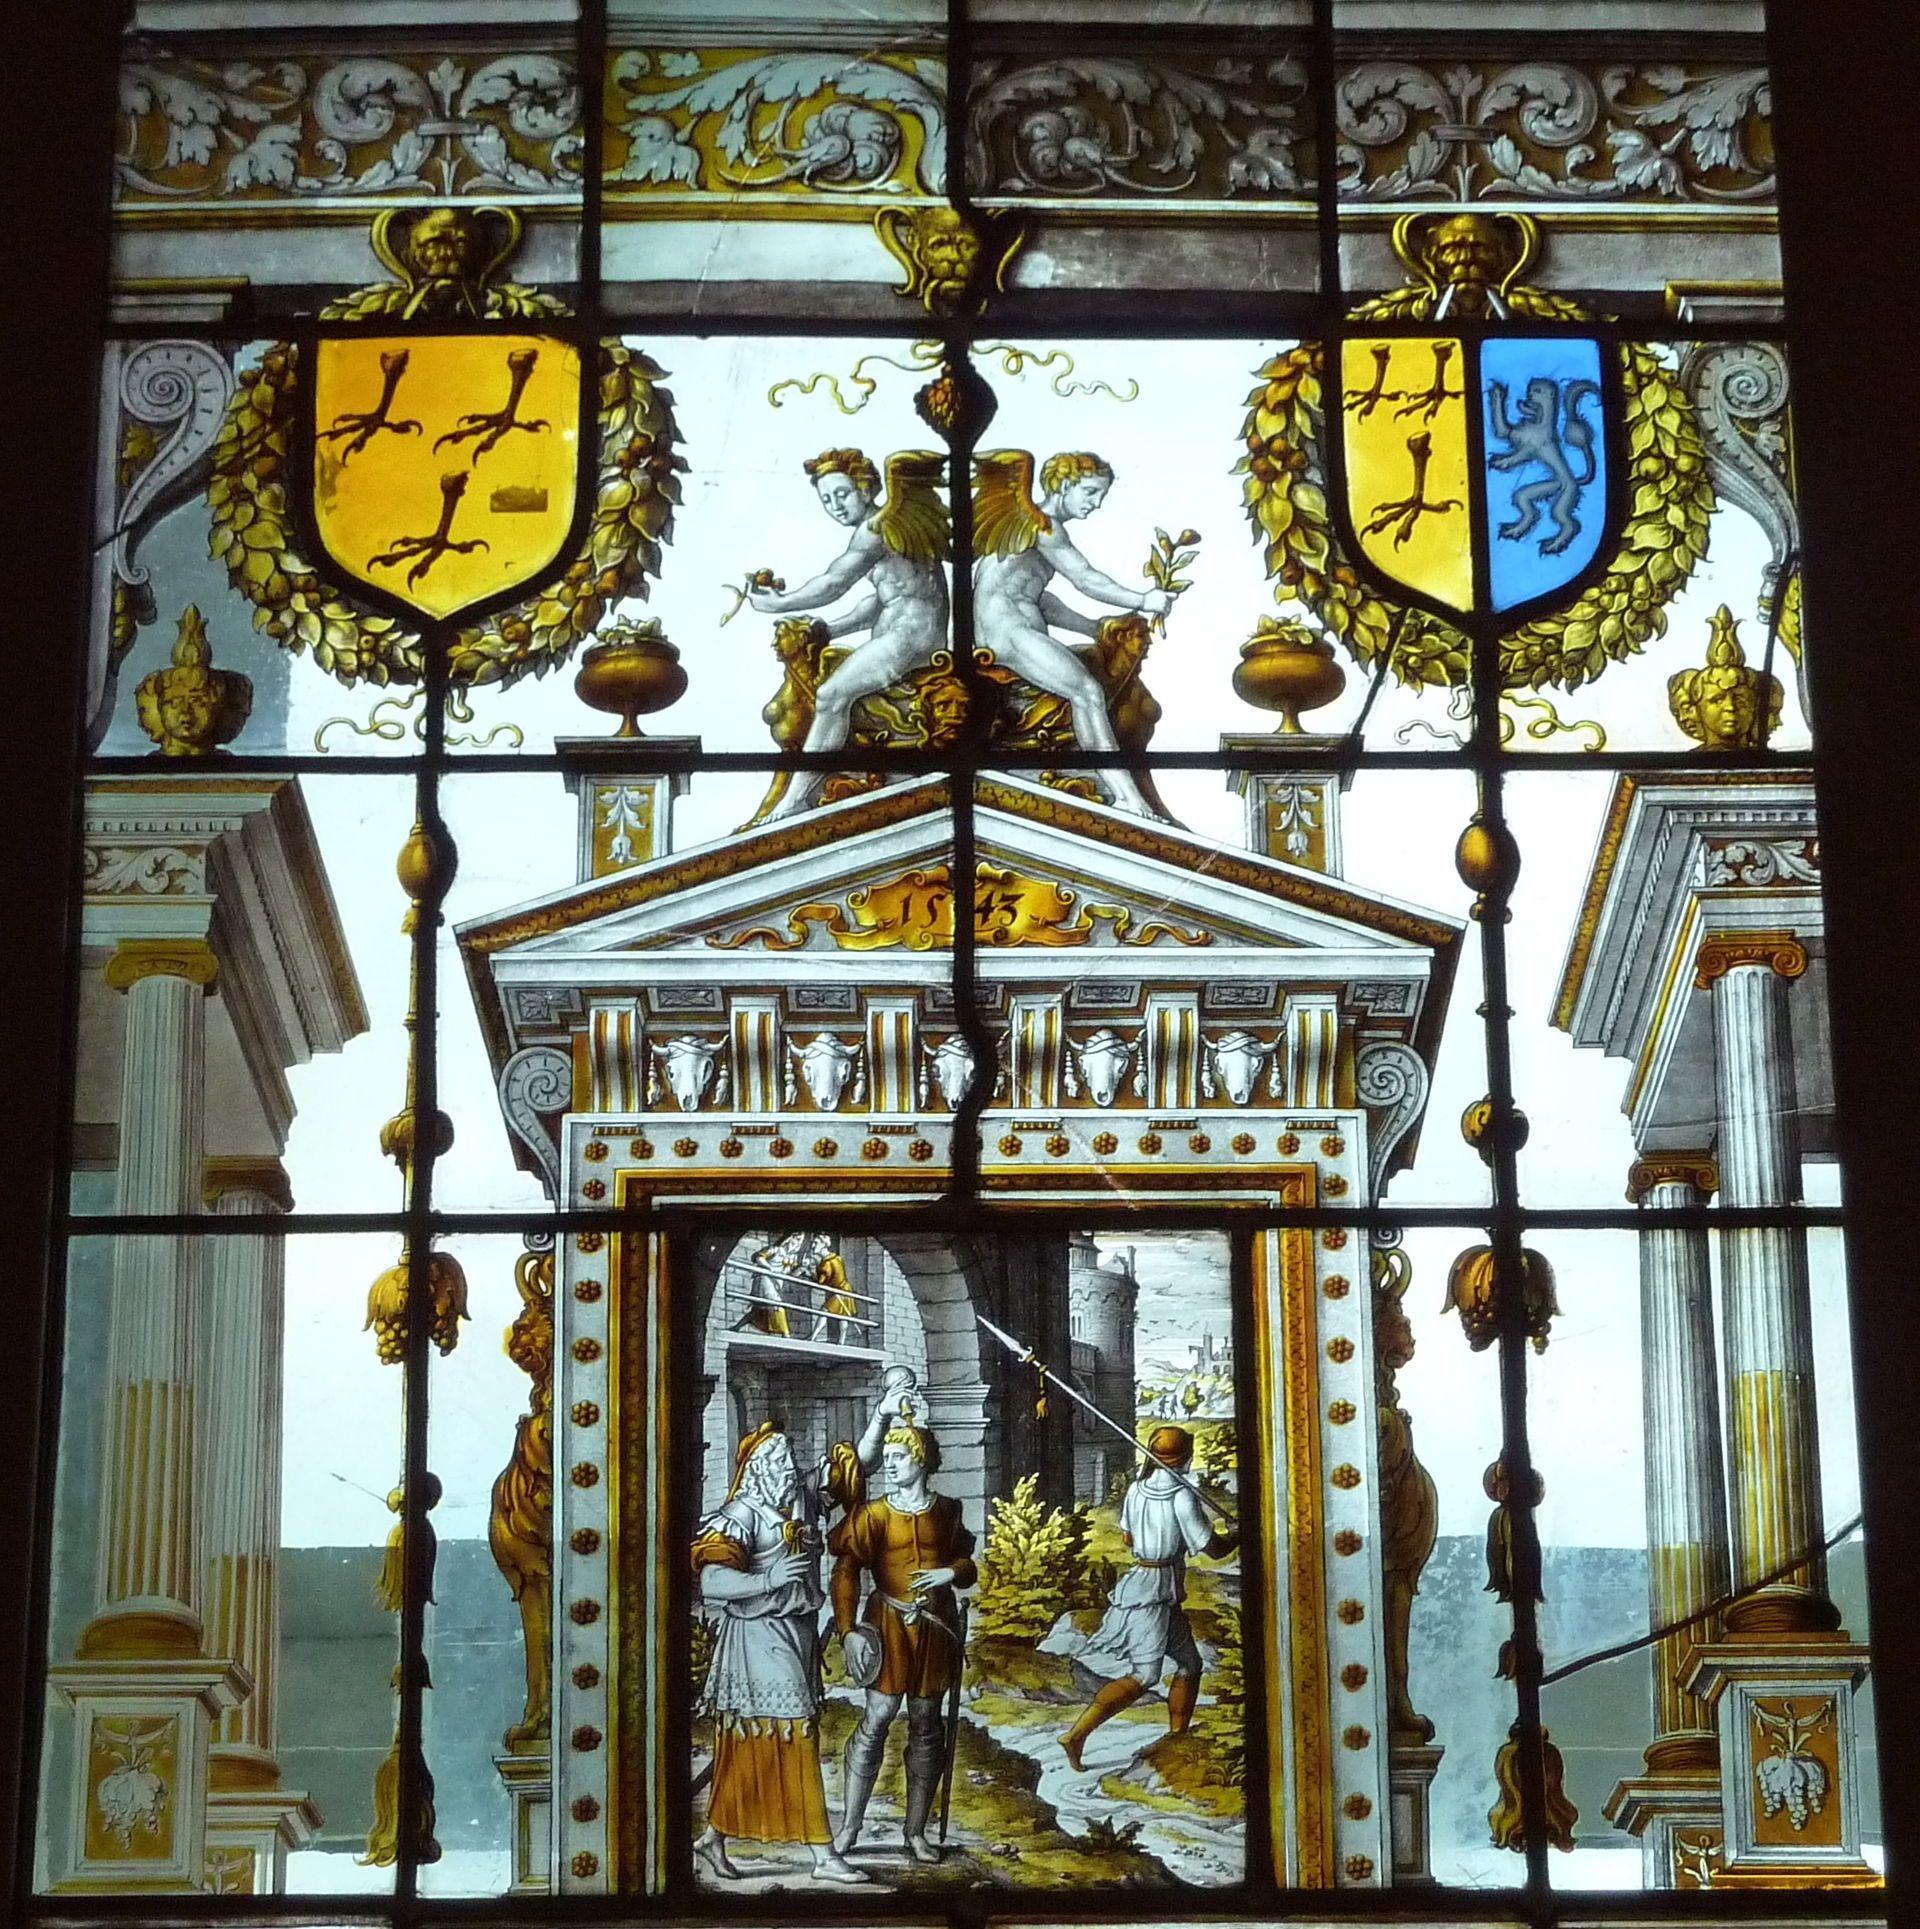 Domestic window by Dirck Crabeth for the house of Adriaen Dircxz. van Crimpen, of Leiden. (1543) The windows show scenes from the lives of the Prophet Samuel and the Apostle Paul. Musée des Arts Décoratifs, Paris